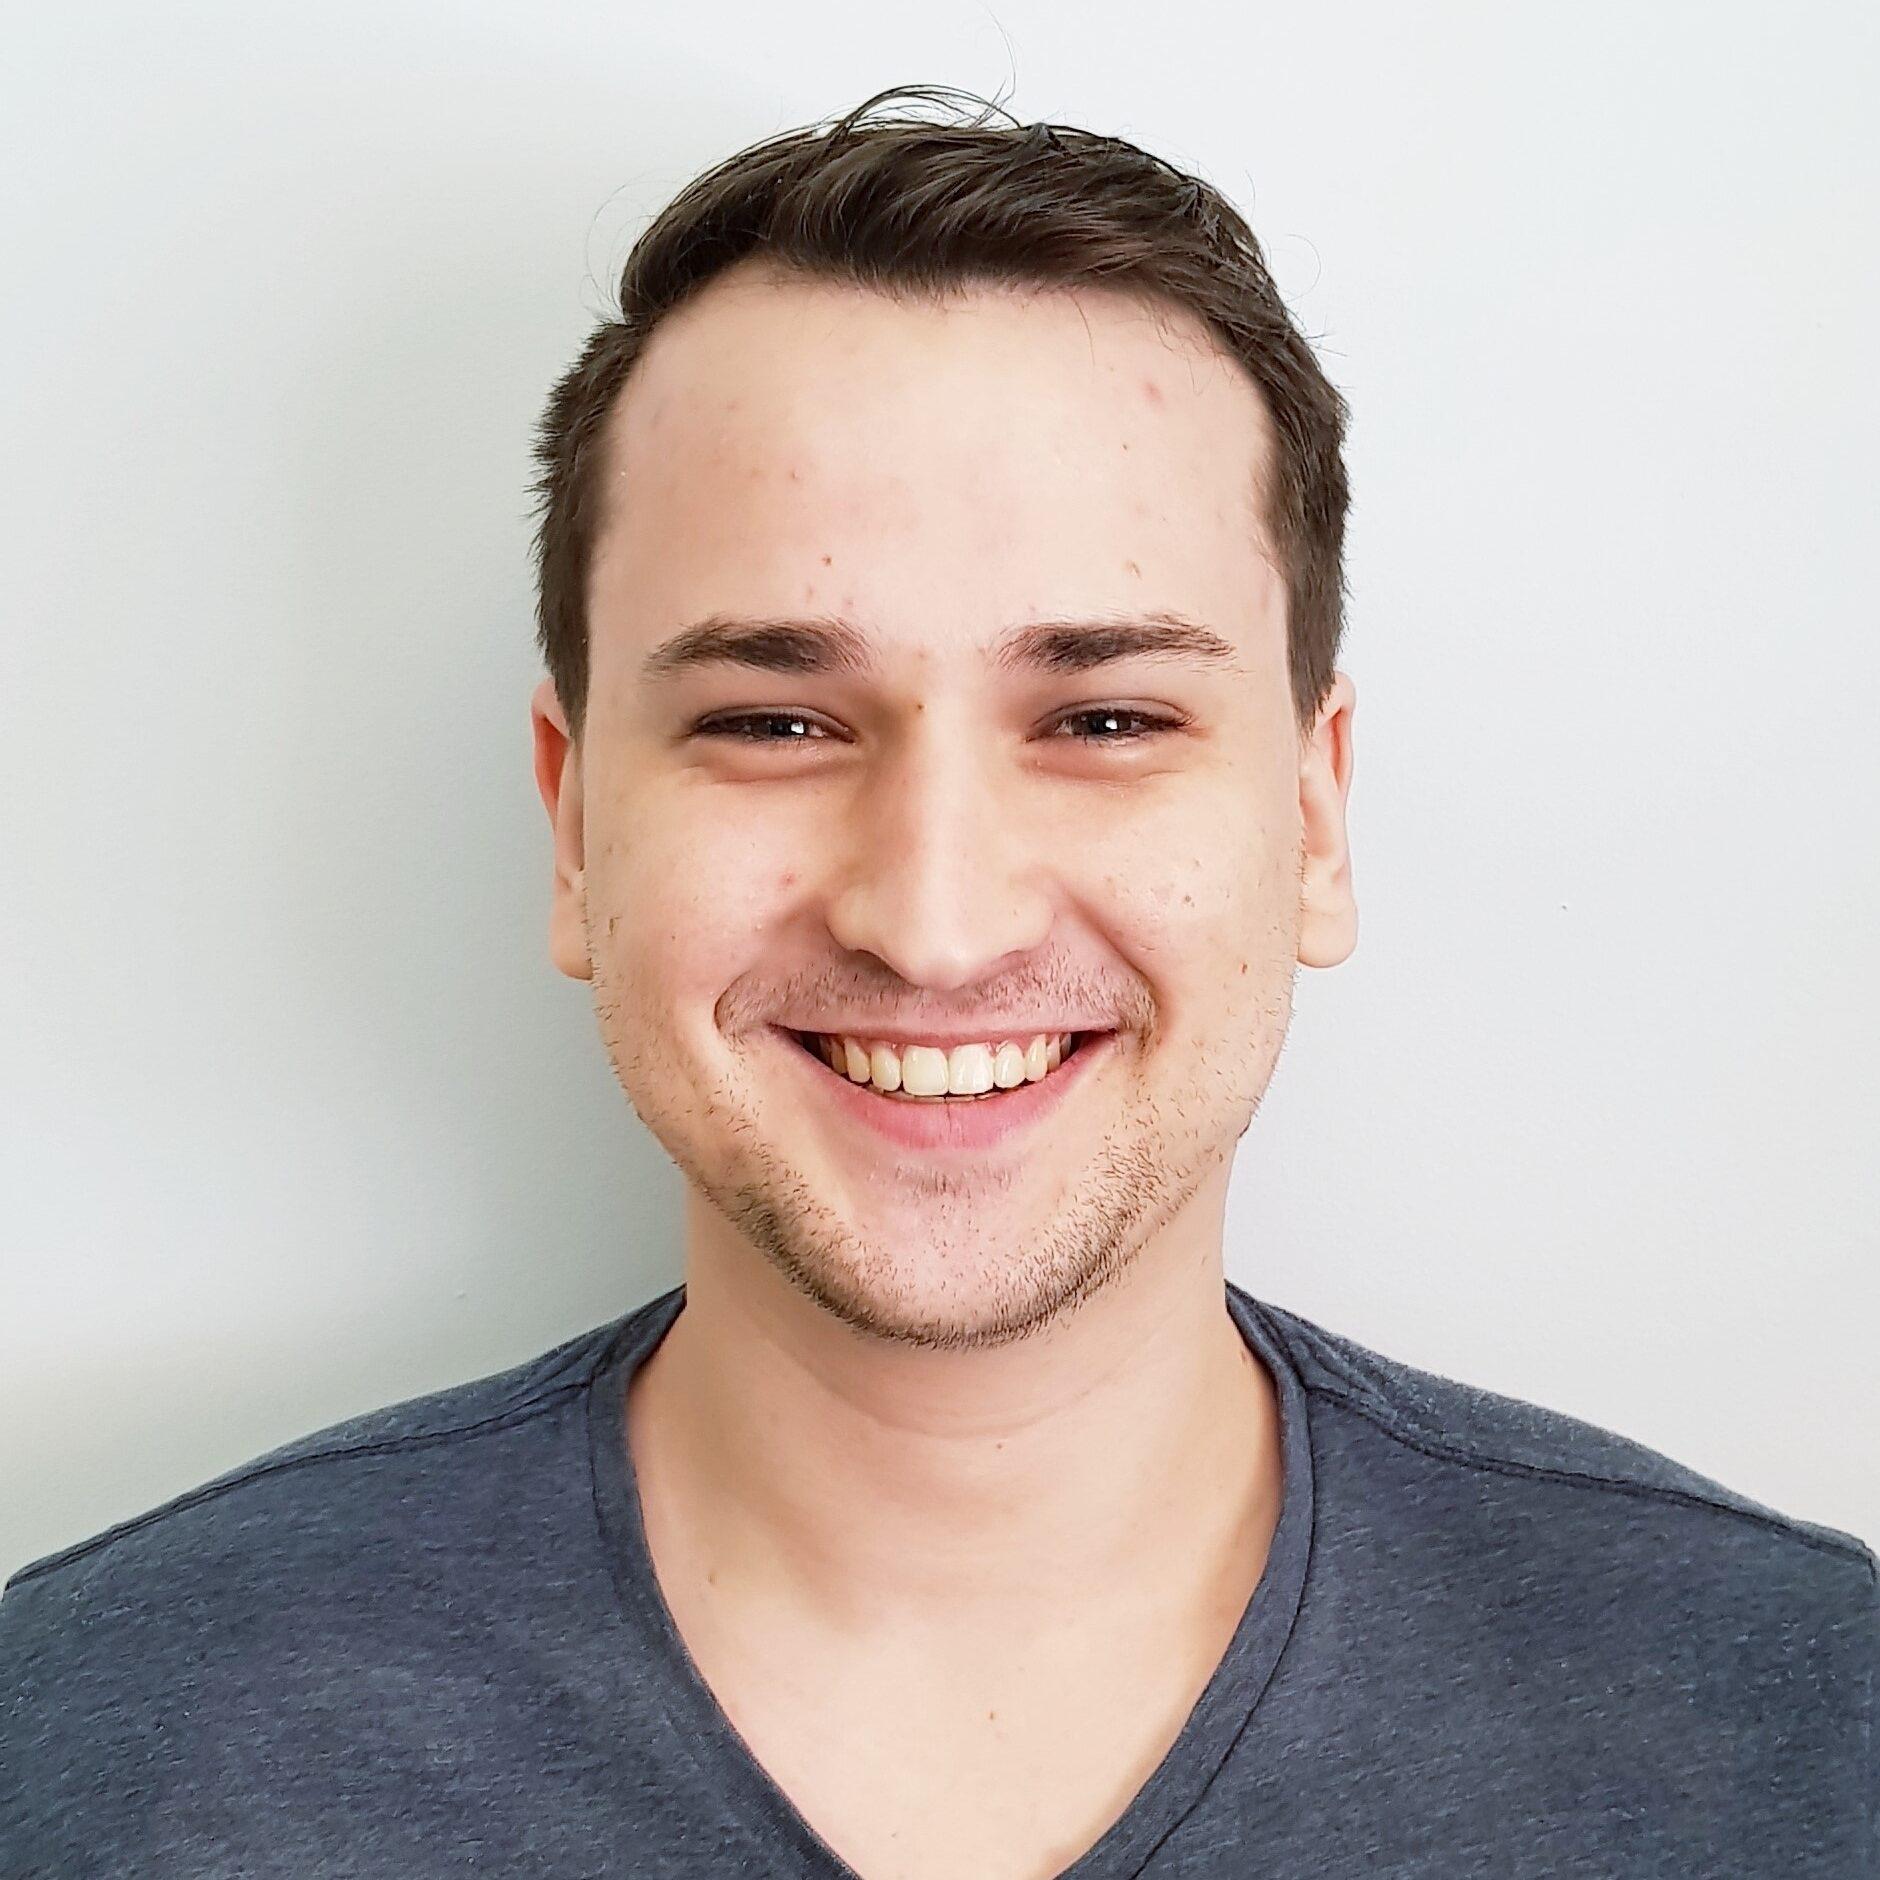 Joshua Koszo Headshot